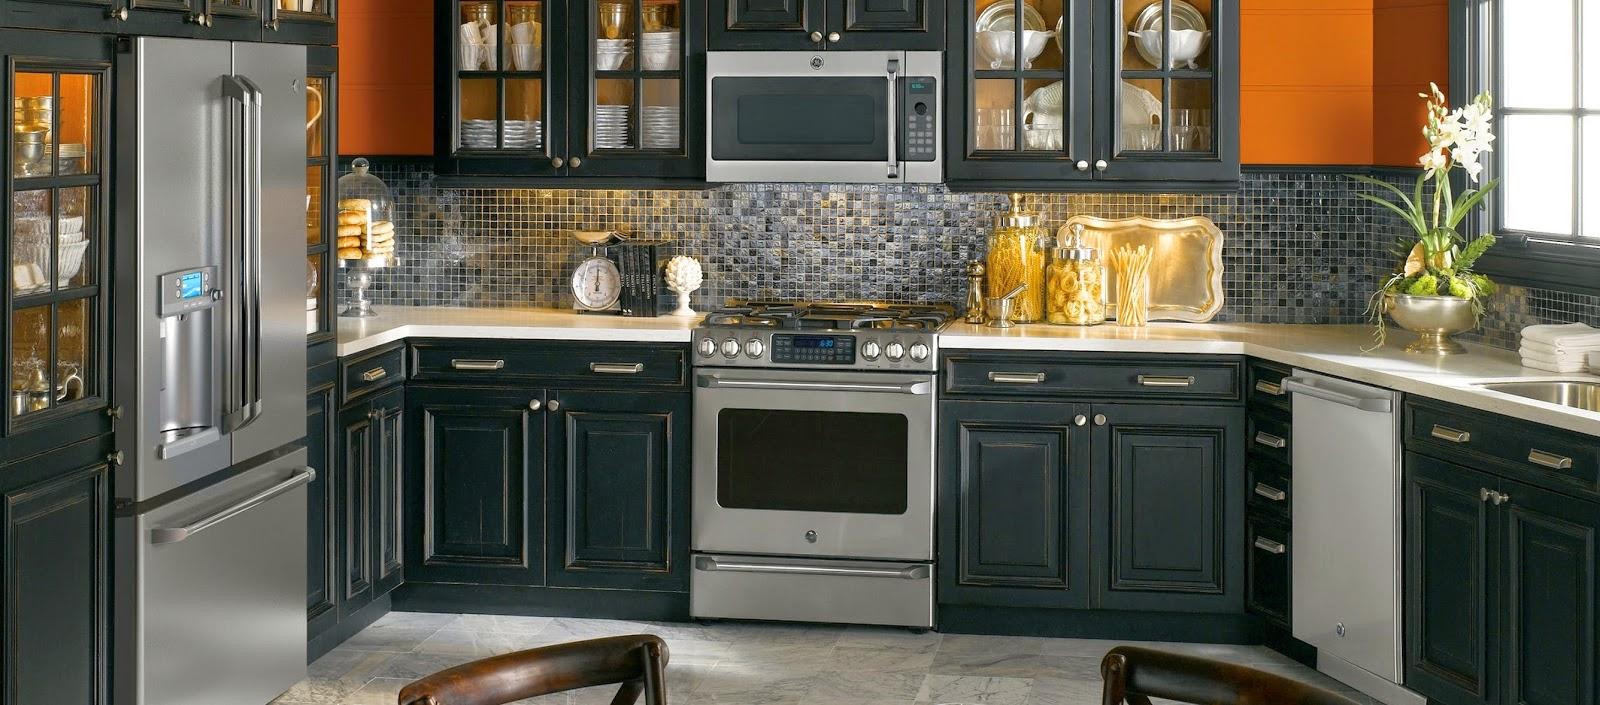 Contemporary Kitchen Ideas with Black Appliances